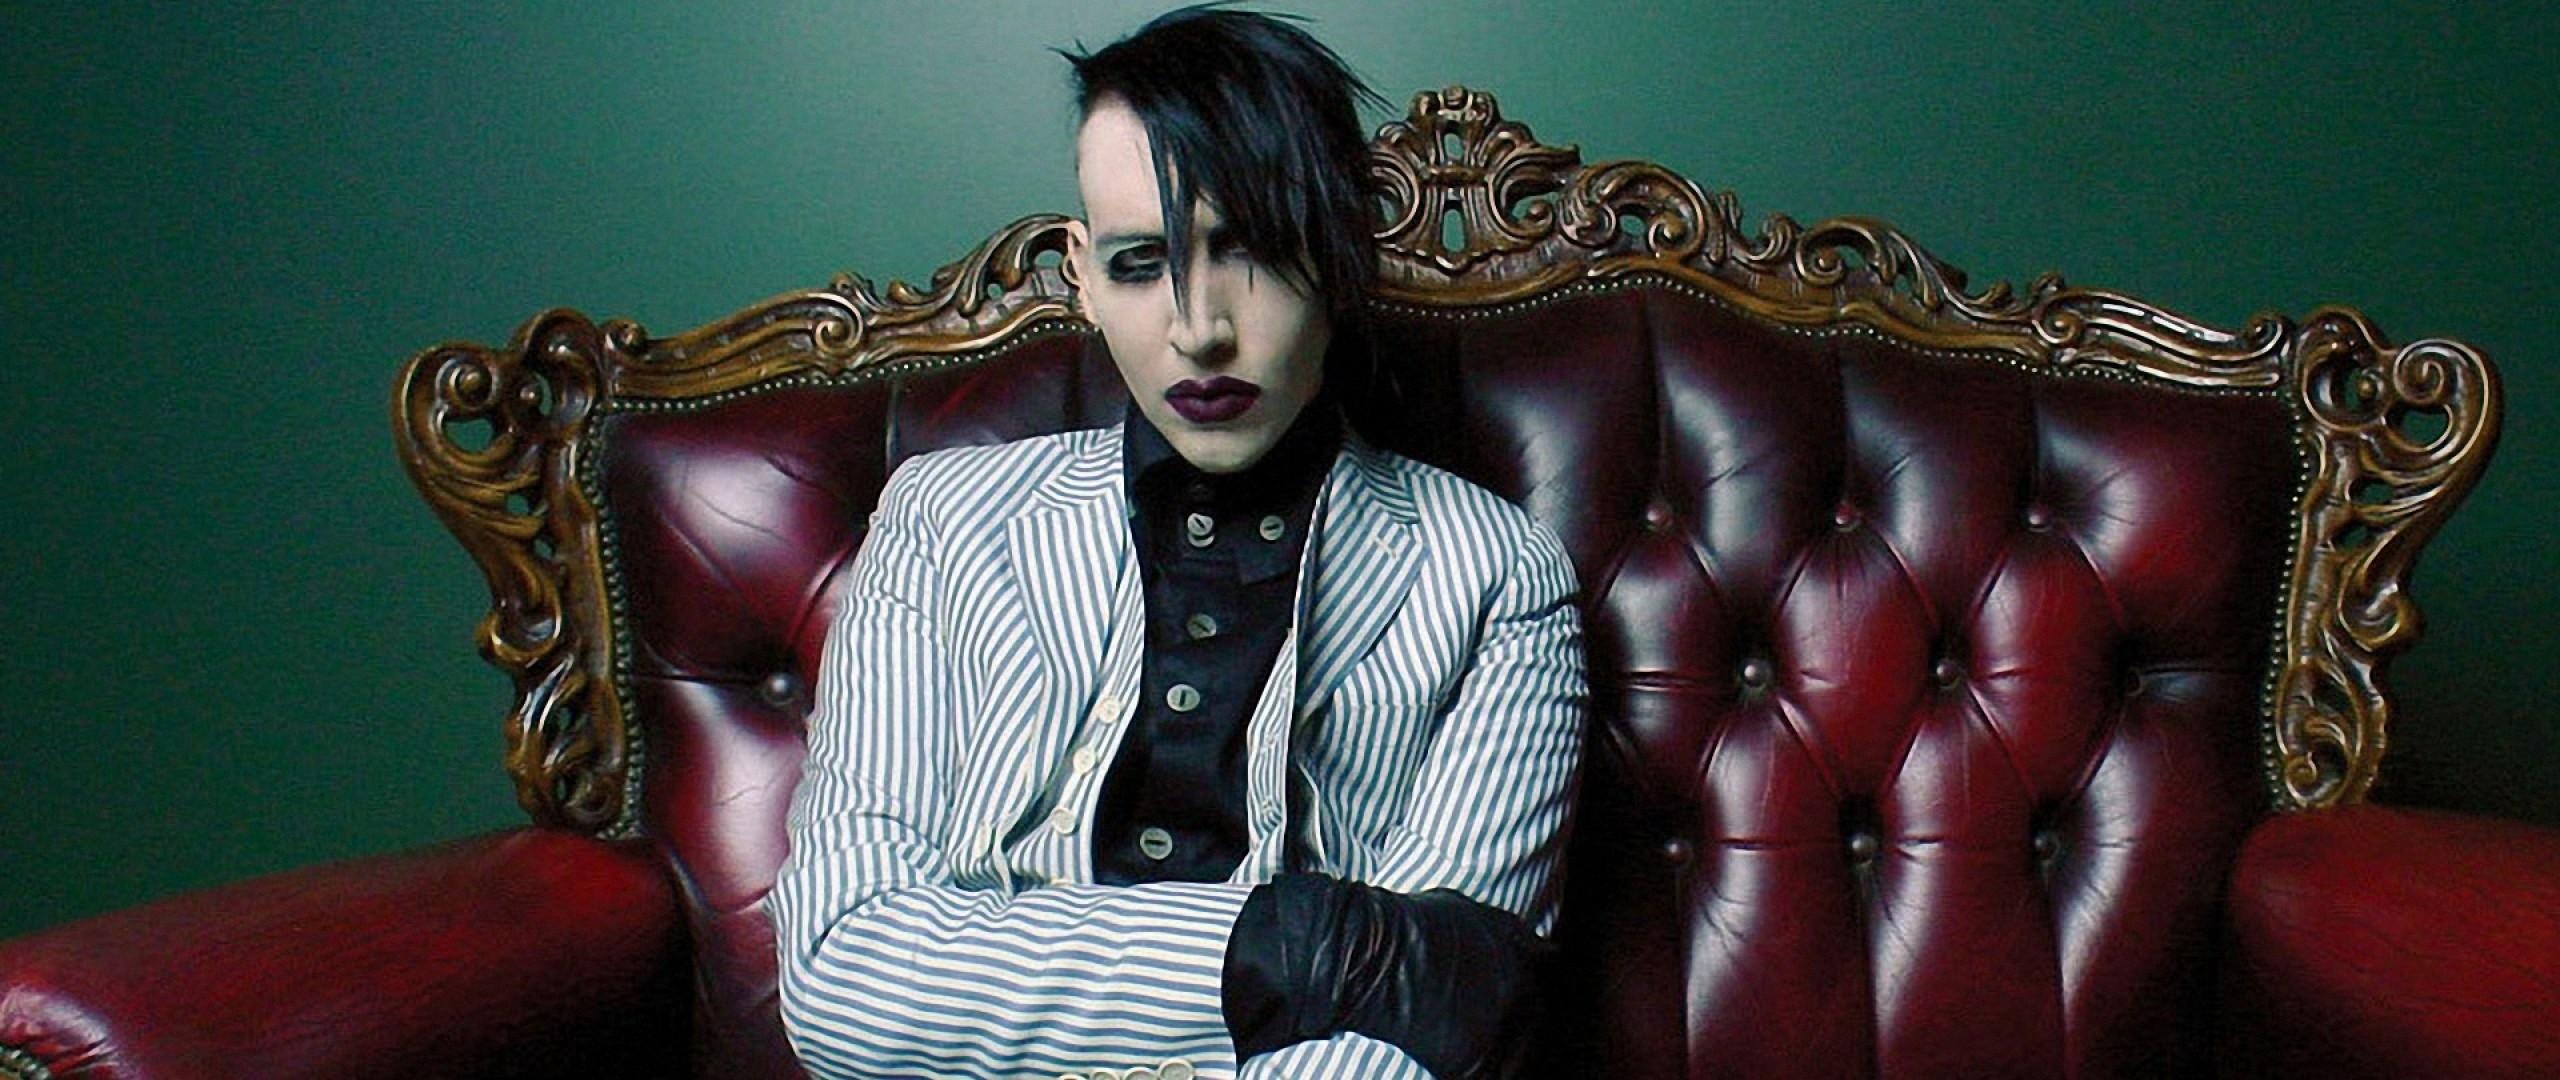 Wallpaper marilyn manson, makeup, image, armchair, lipstick